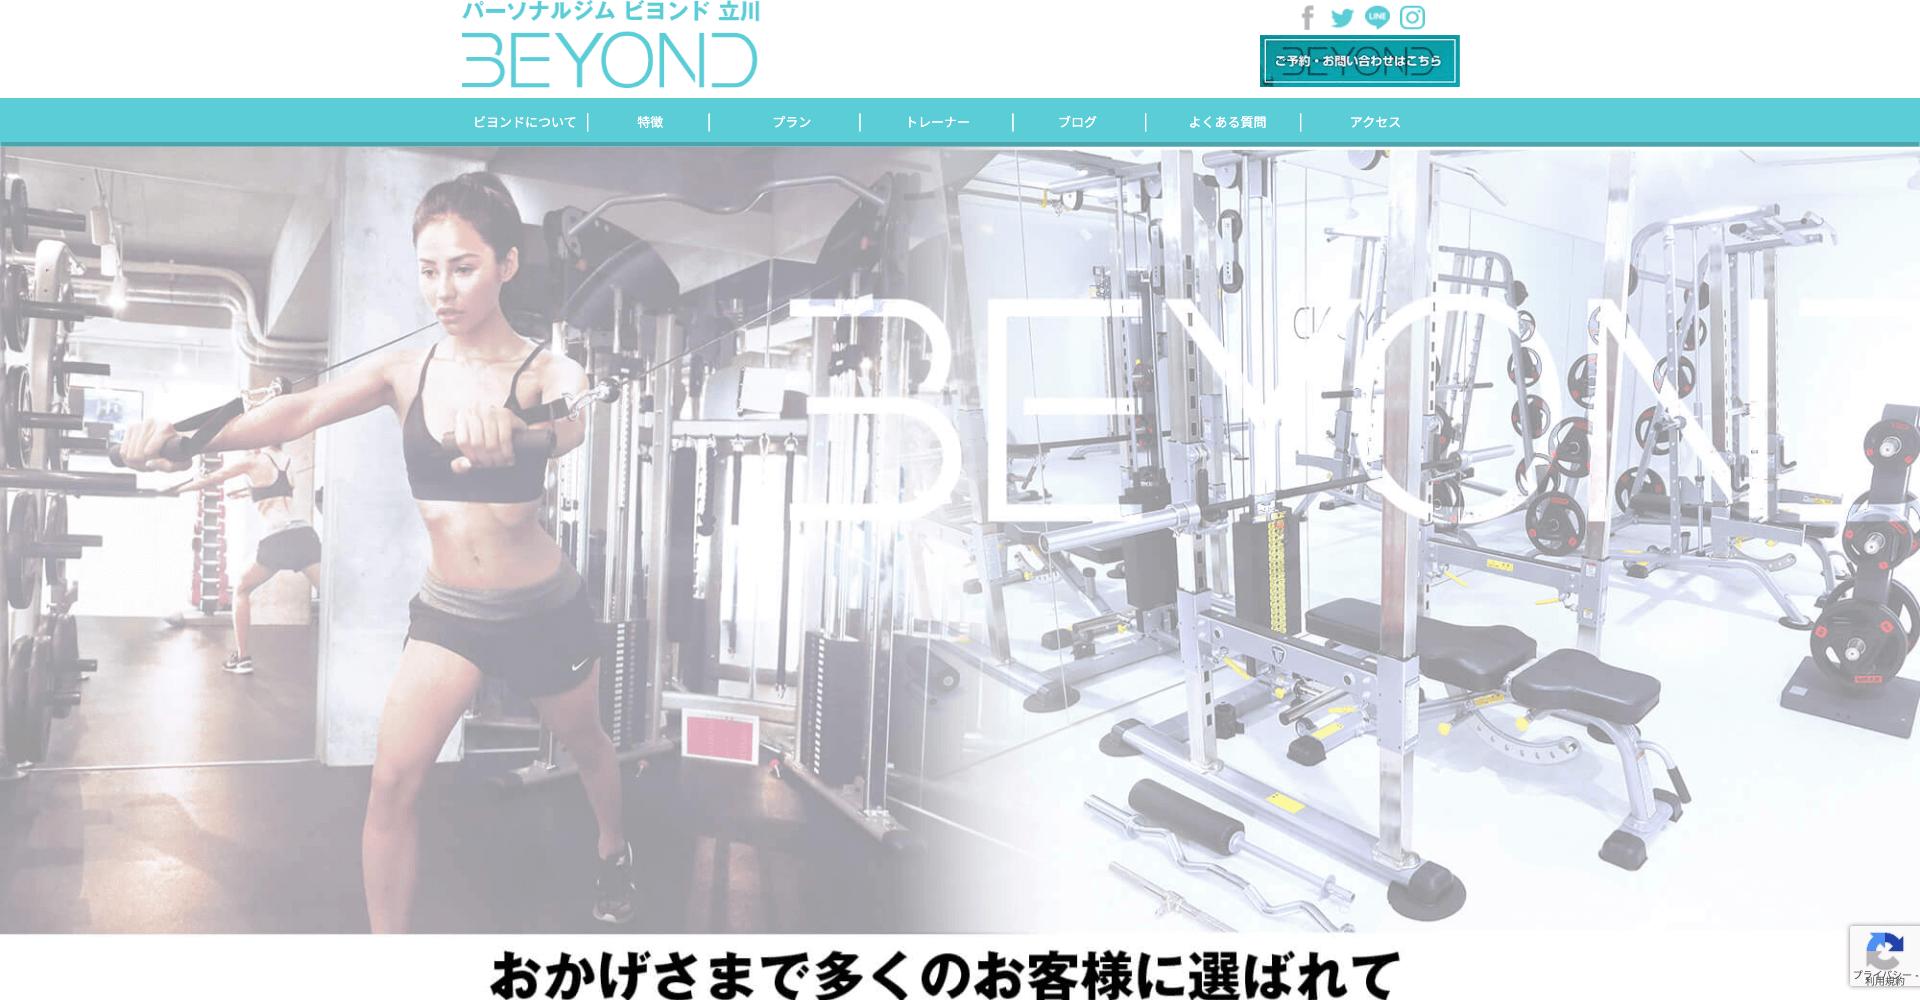 BEYOND(ビヨンド)ジム 立川ANNEX店